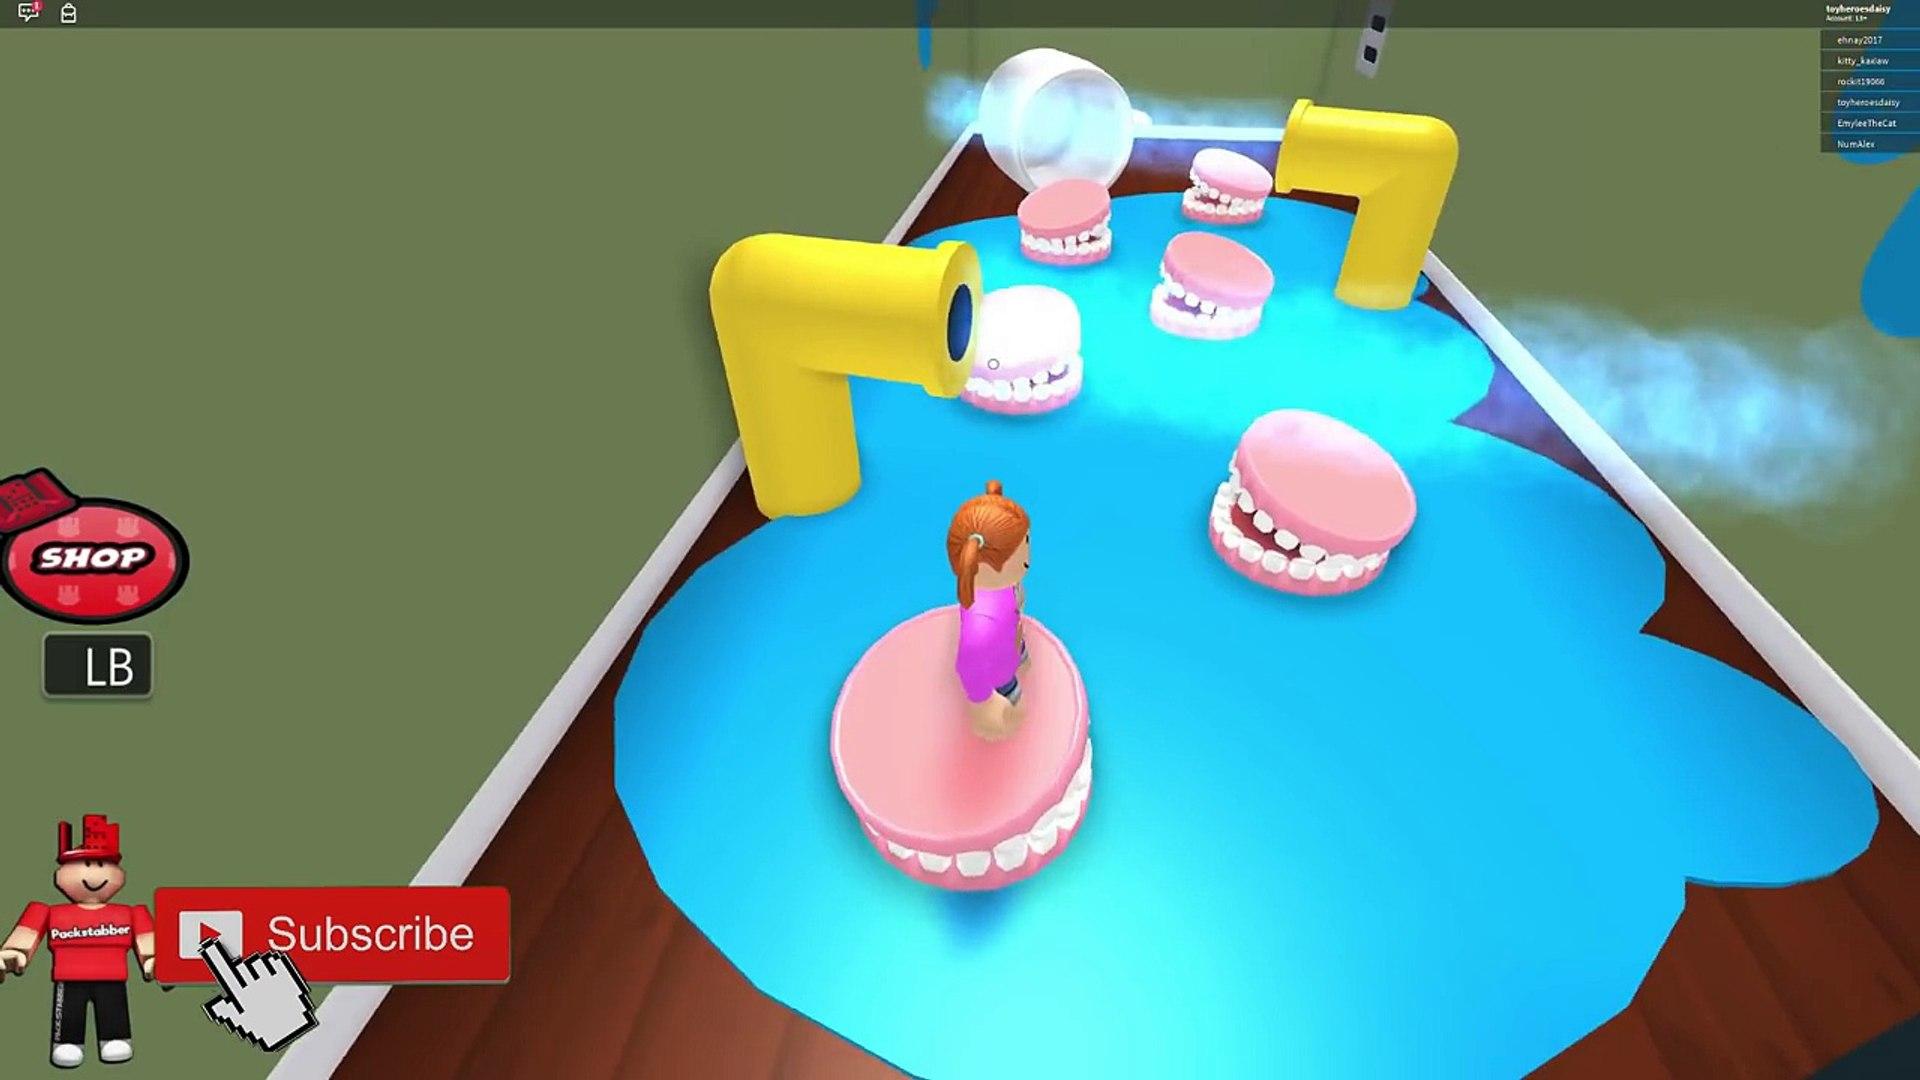 Roblox Escape Grandmas House Obby With Daisy - sis vs bro roblox granny youtube